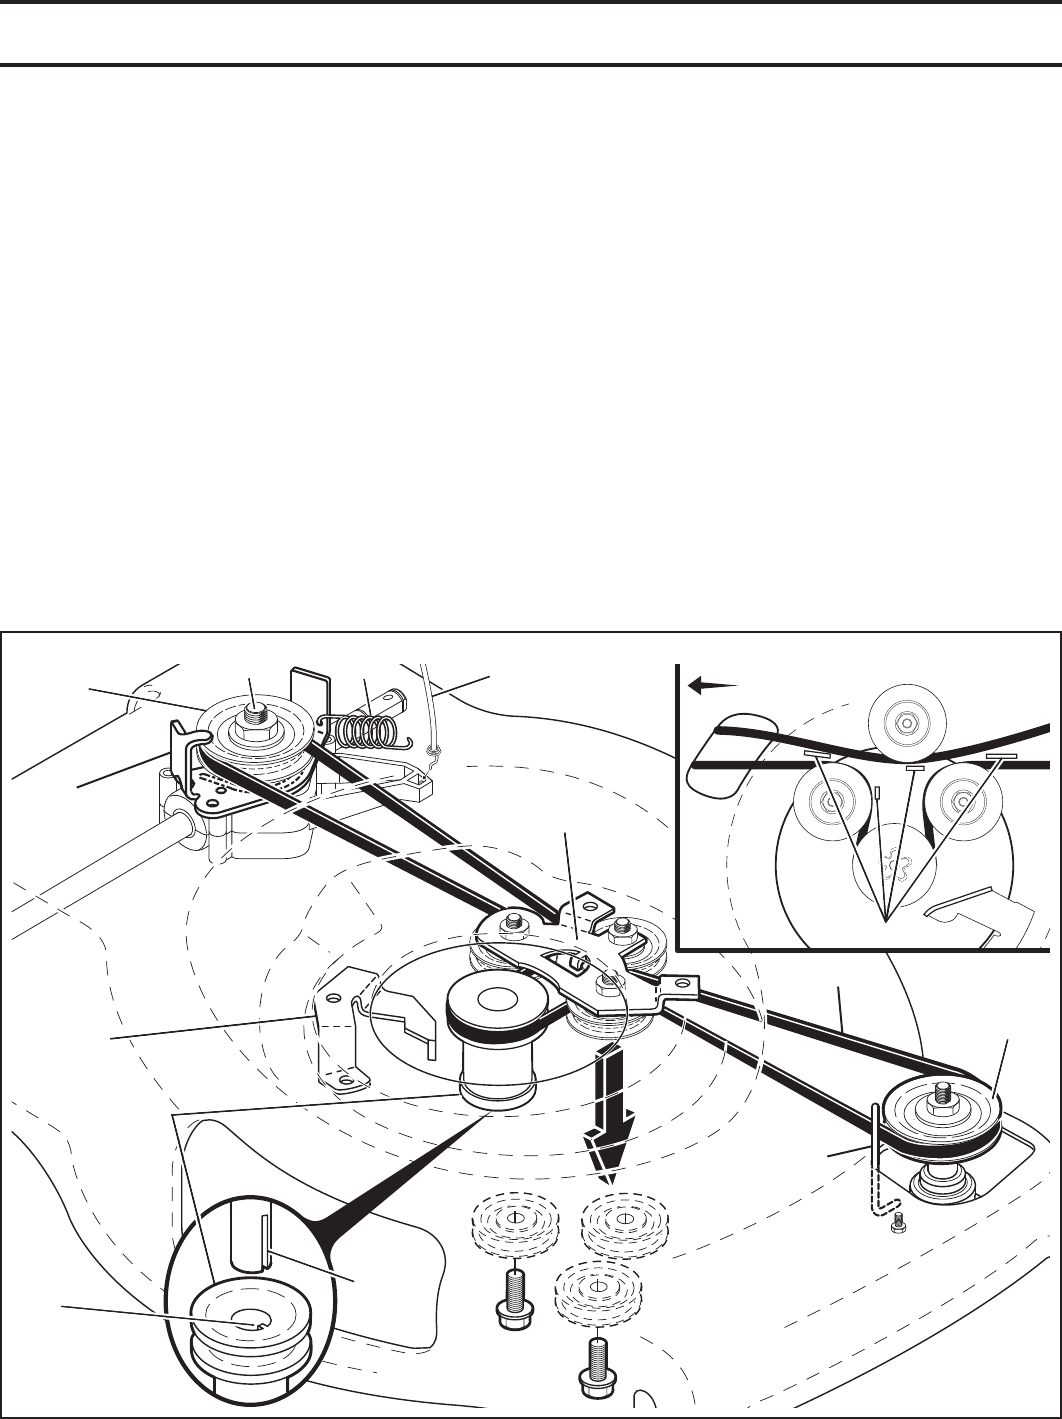 Husqvarna HU800AWD TO REPLACE DRIVE BELT (See Figs. 19 & 20)